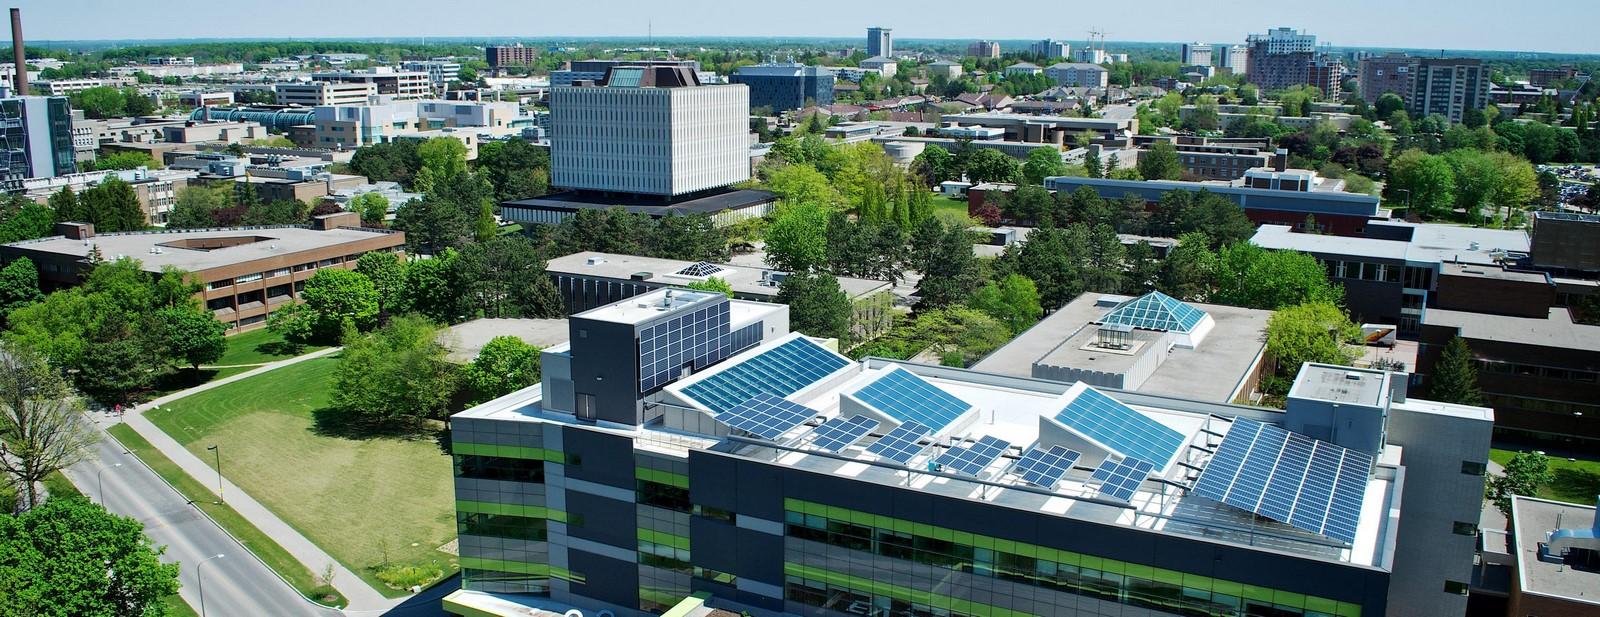 University of Waterloo Environment Building 3 - Sheet1